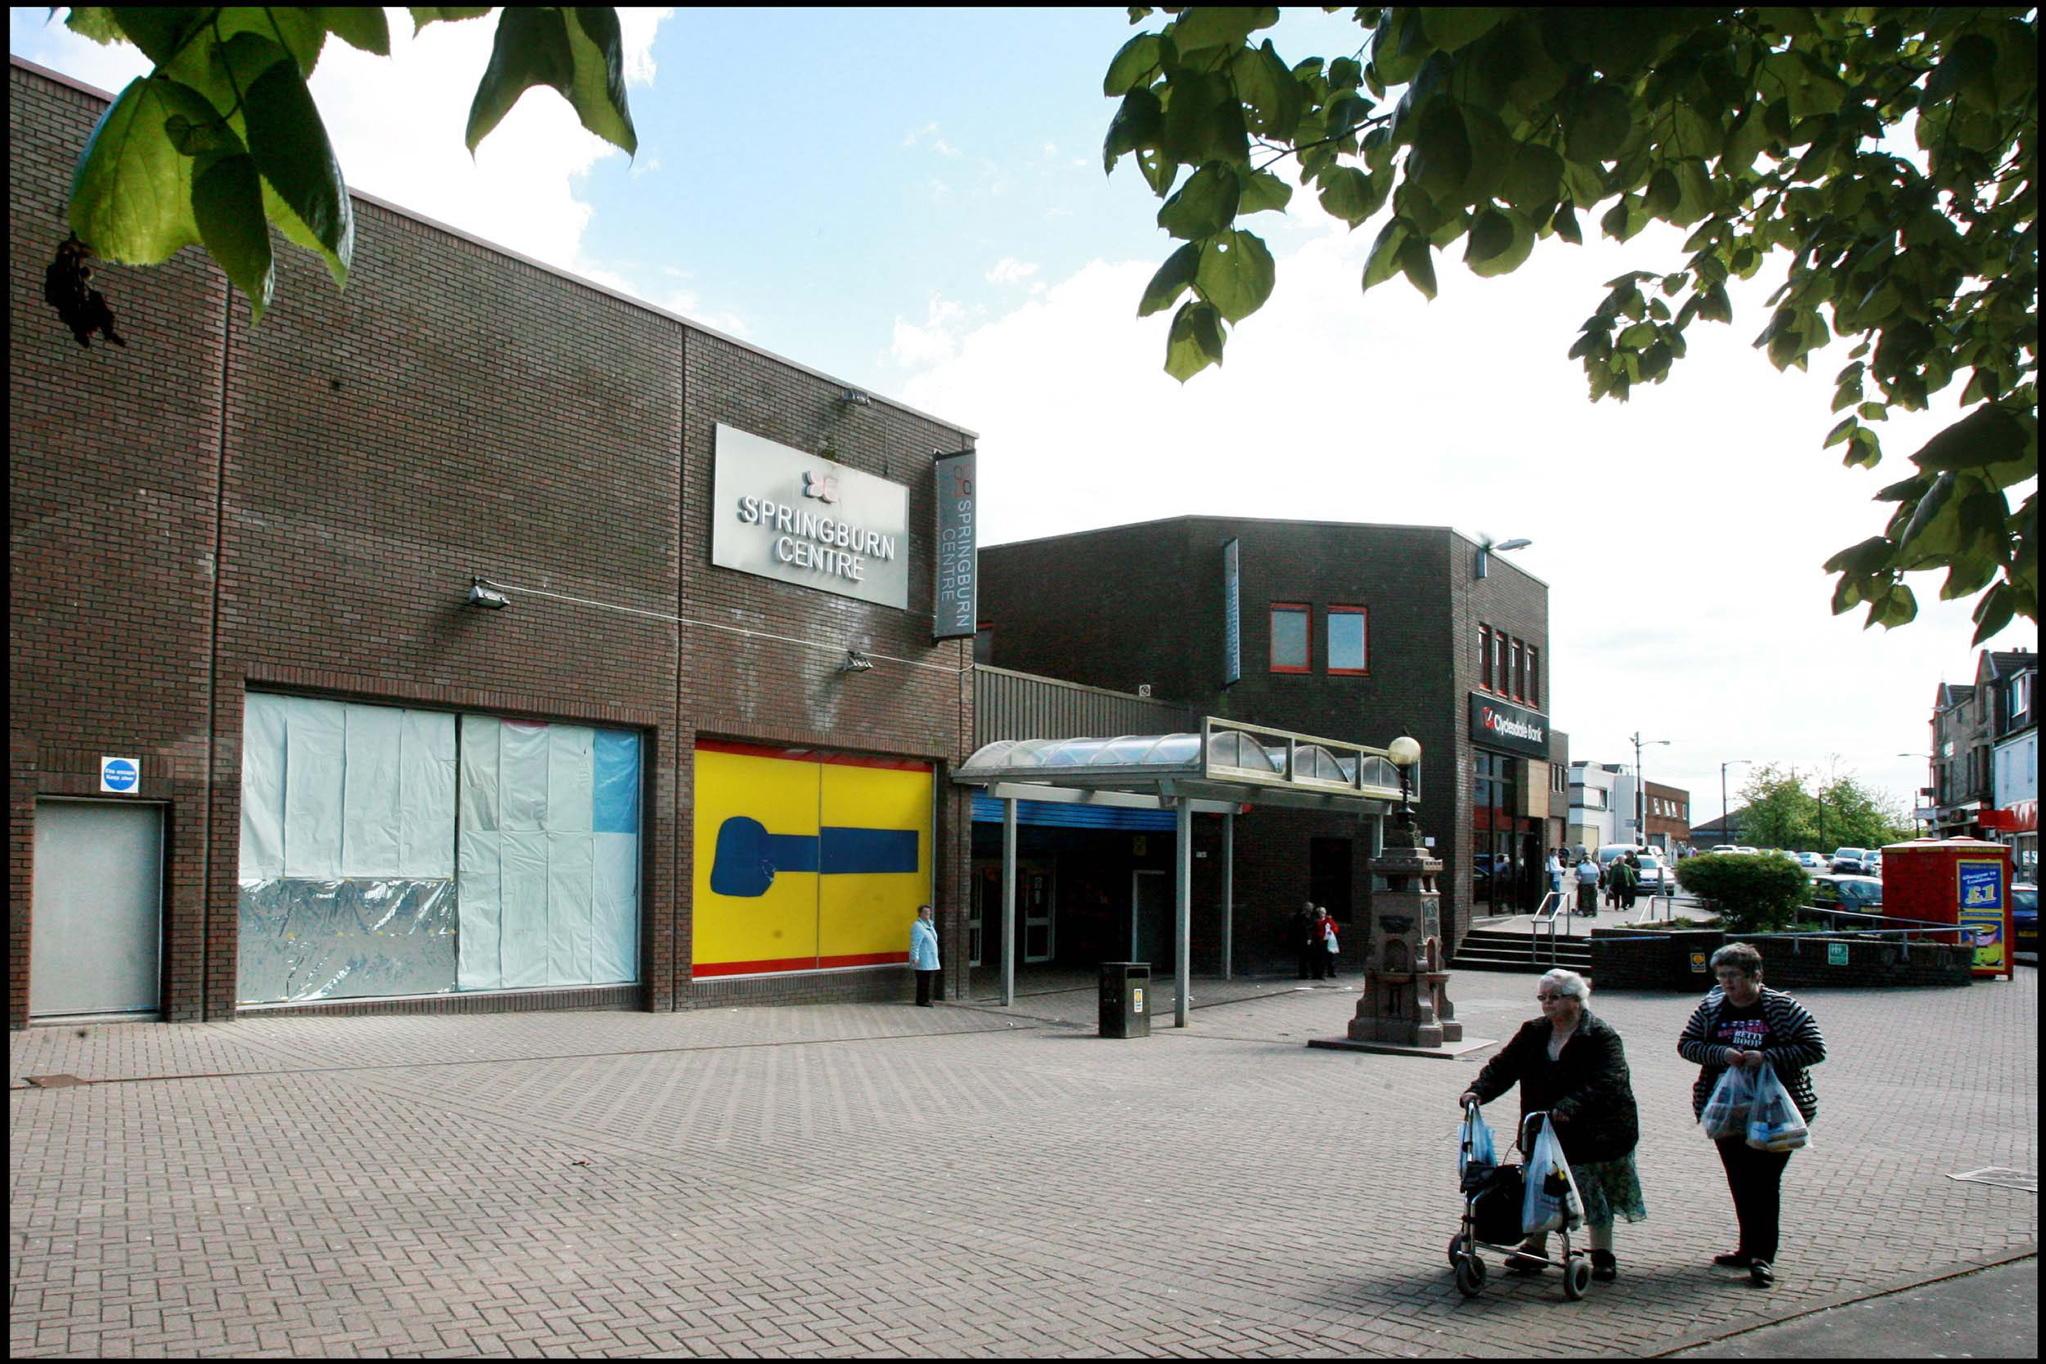 Springburn shopping centre toilets